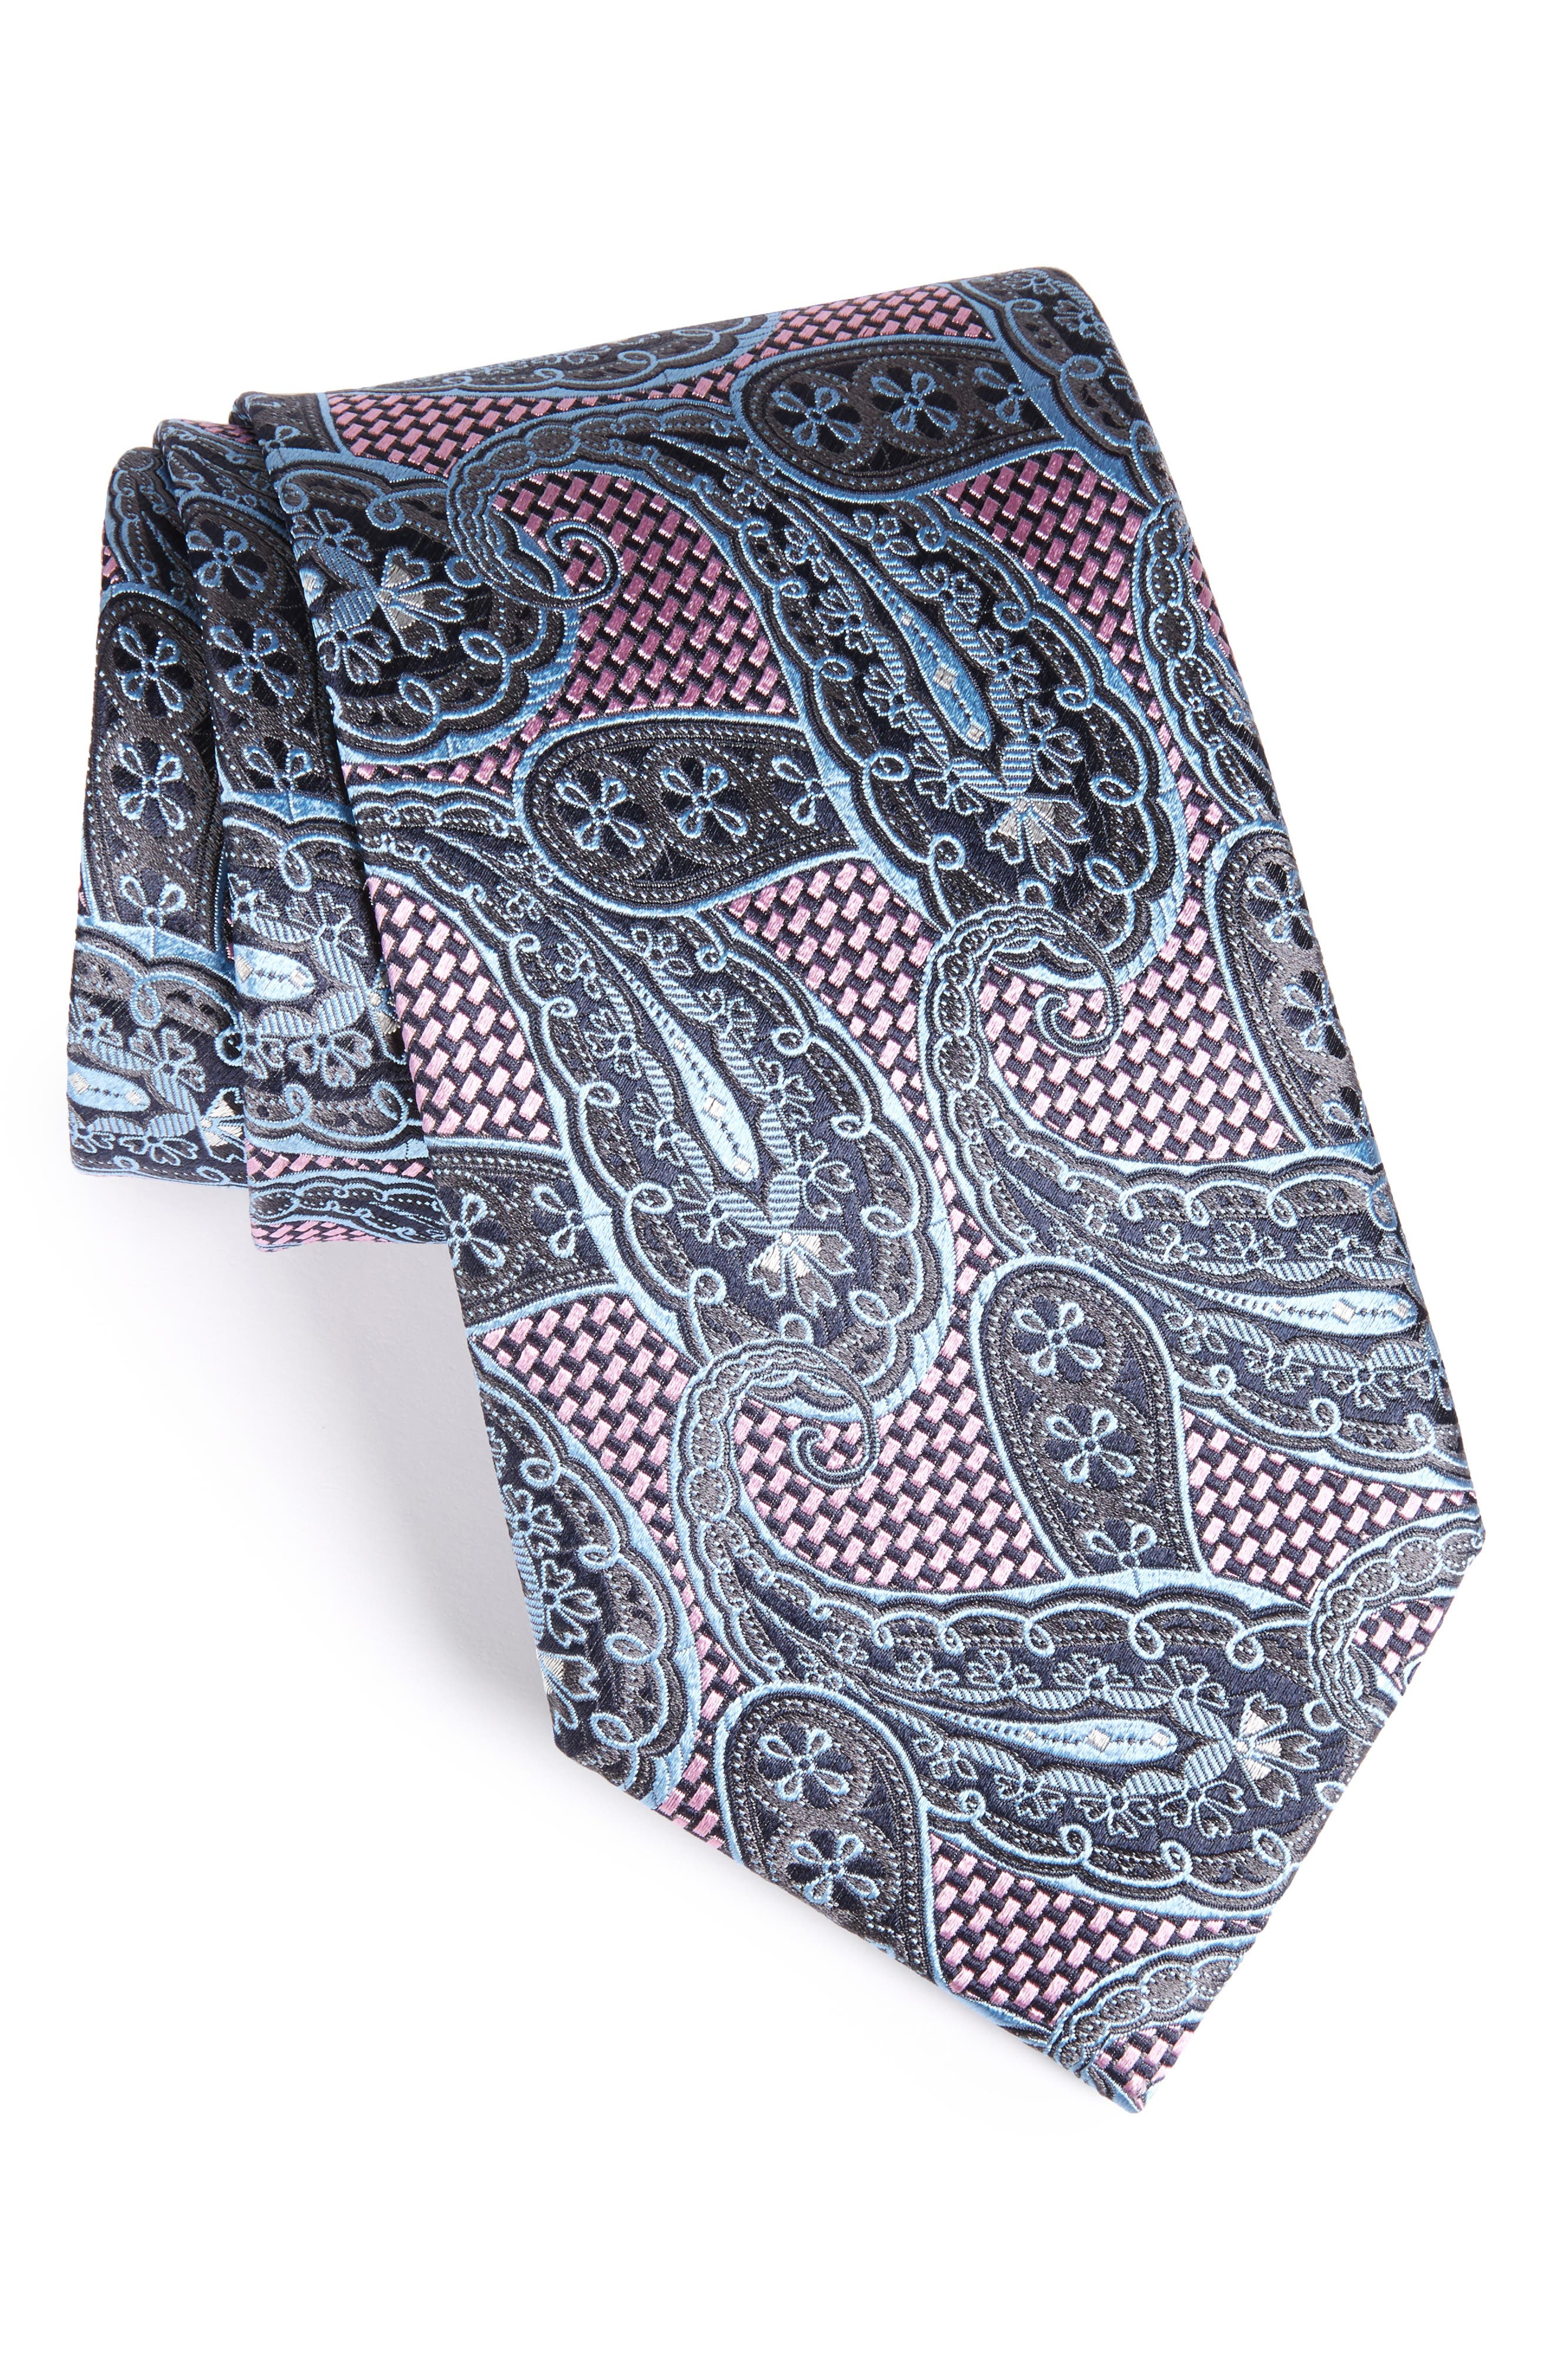 Main Image - Ermenegildo Zegna Paisley Silk Tie (X-Long)